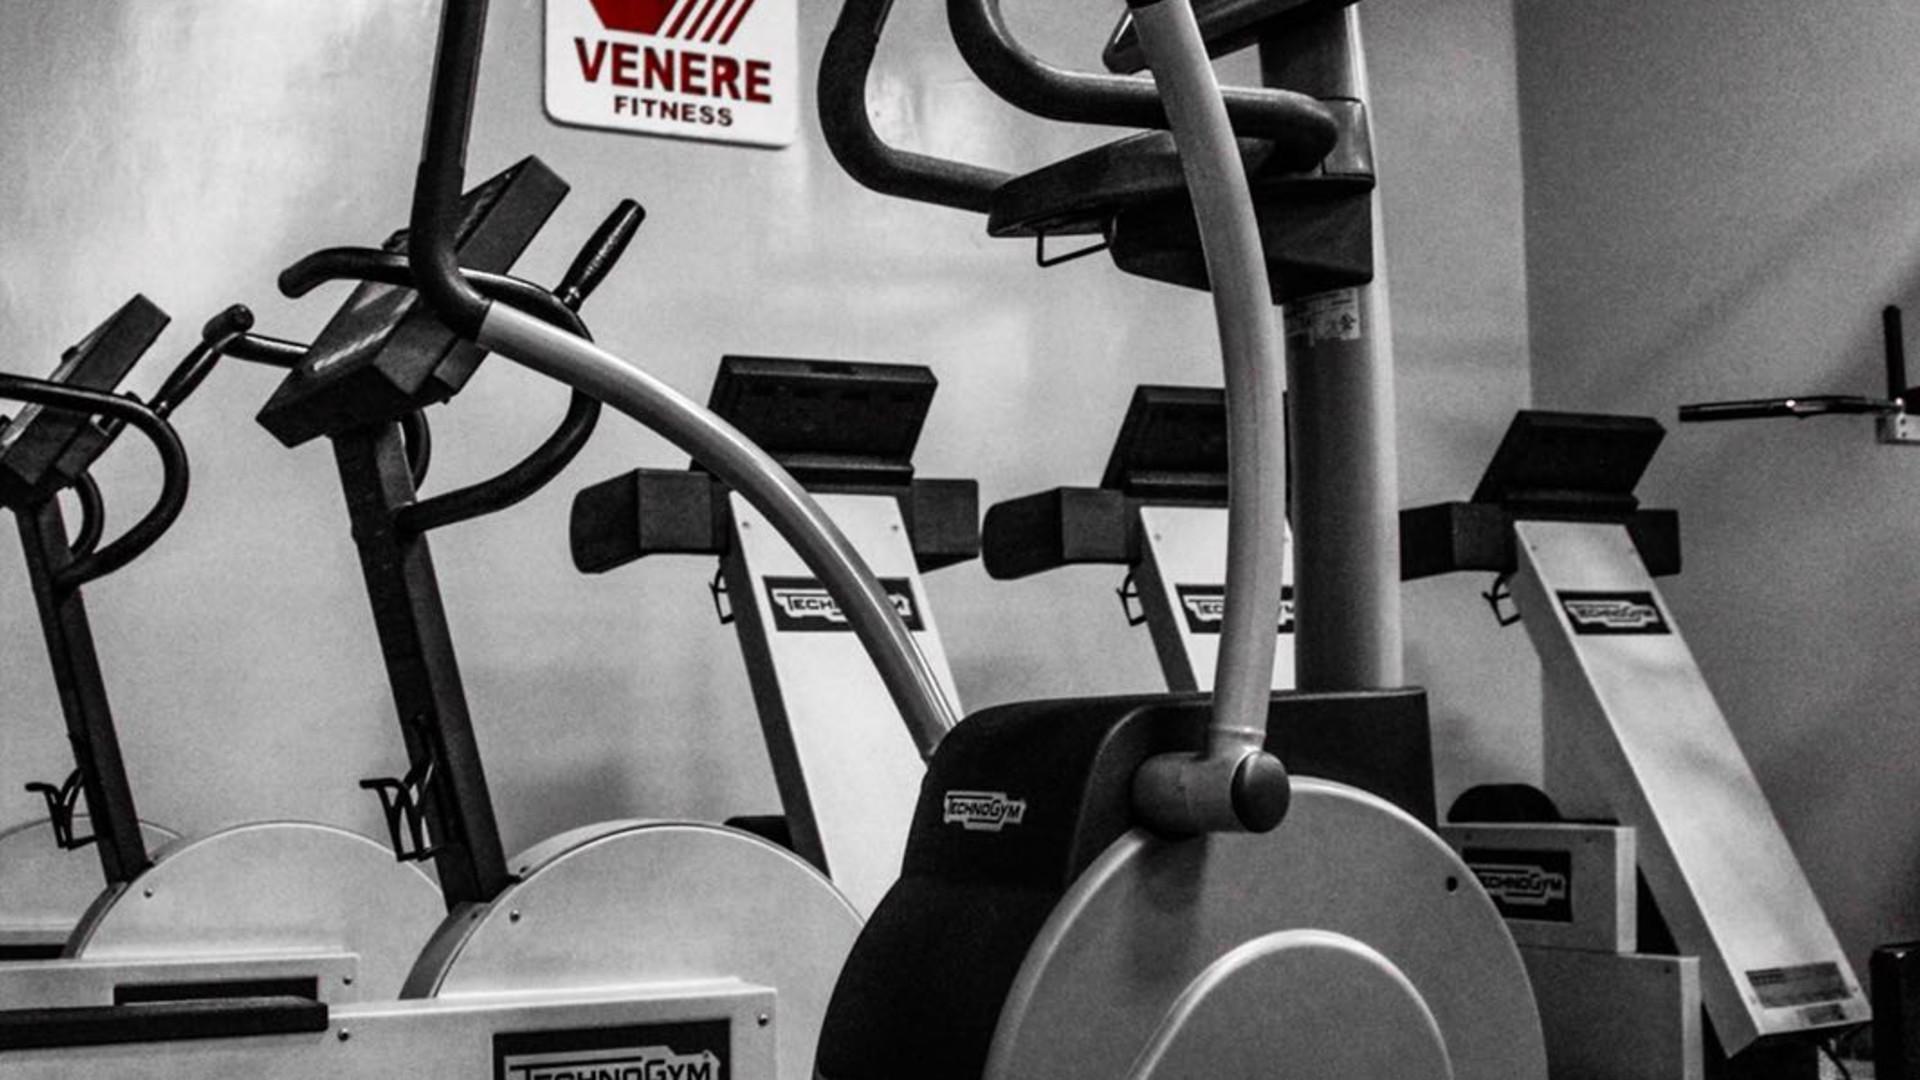 Venere Fitness Club offerte